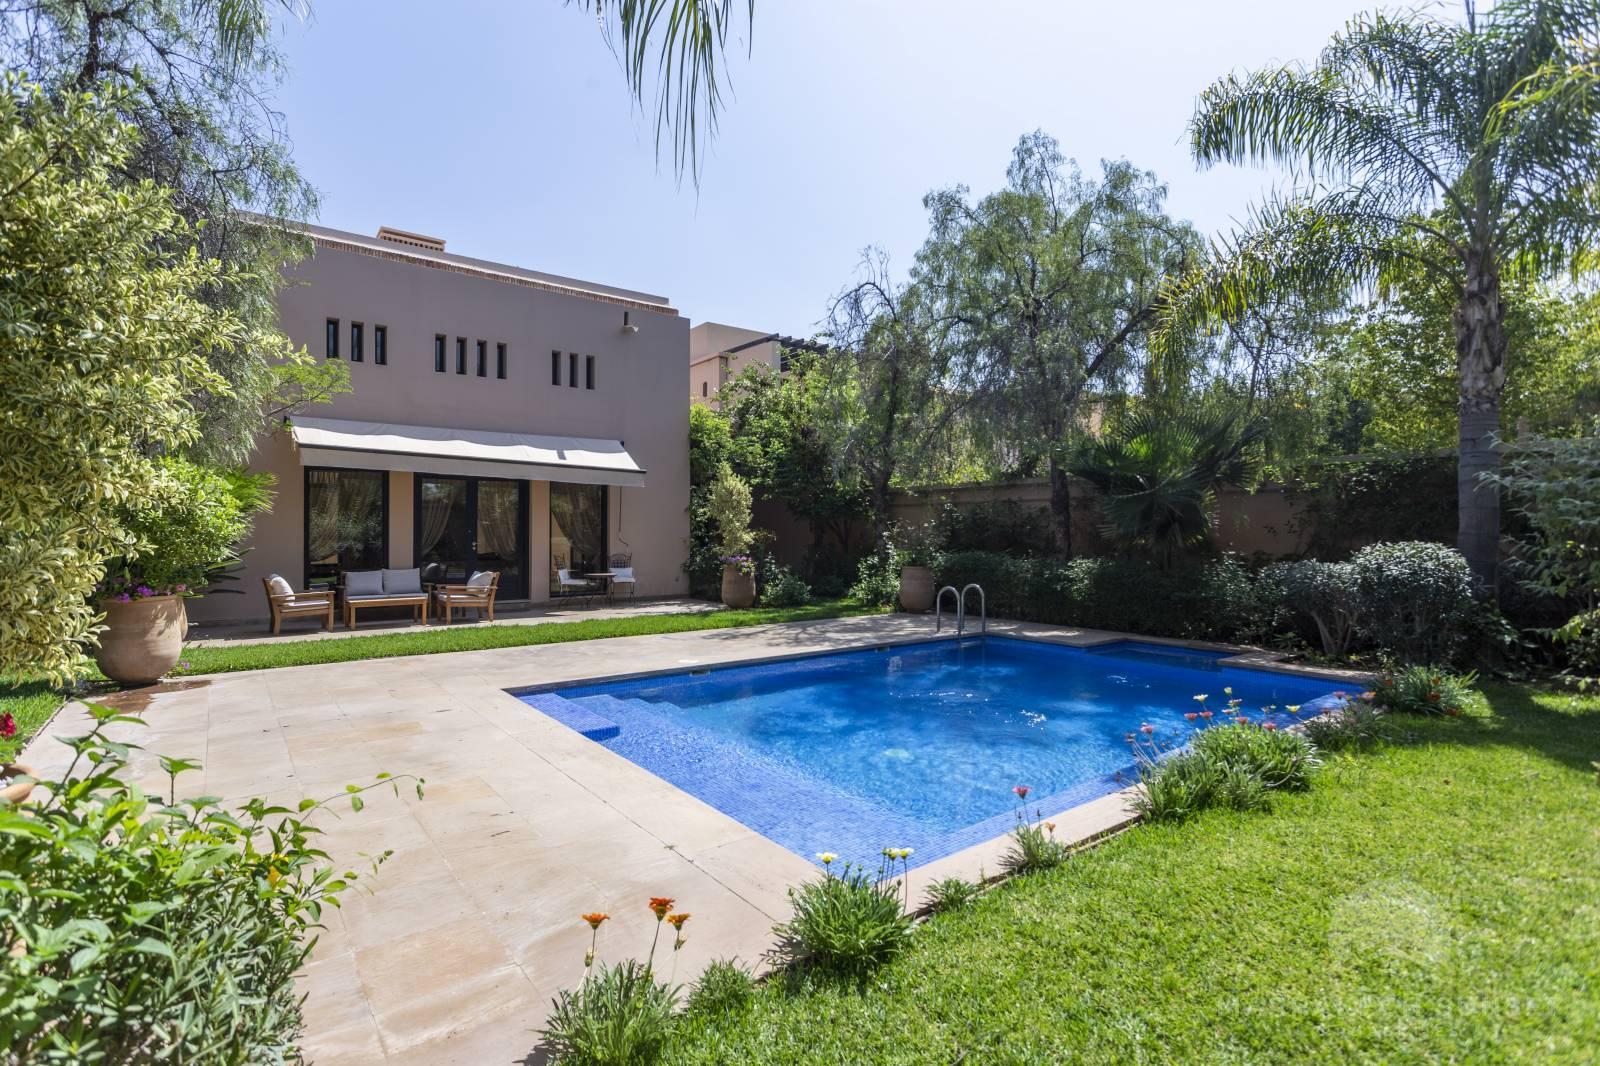 Modern 02 bedroom luxury villa for sale in Marrakech in a residential complex